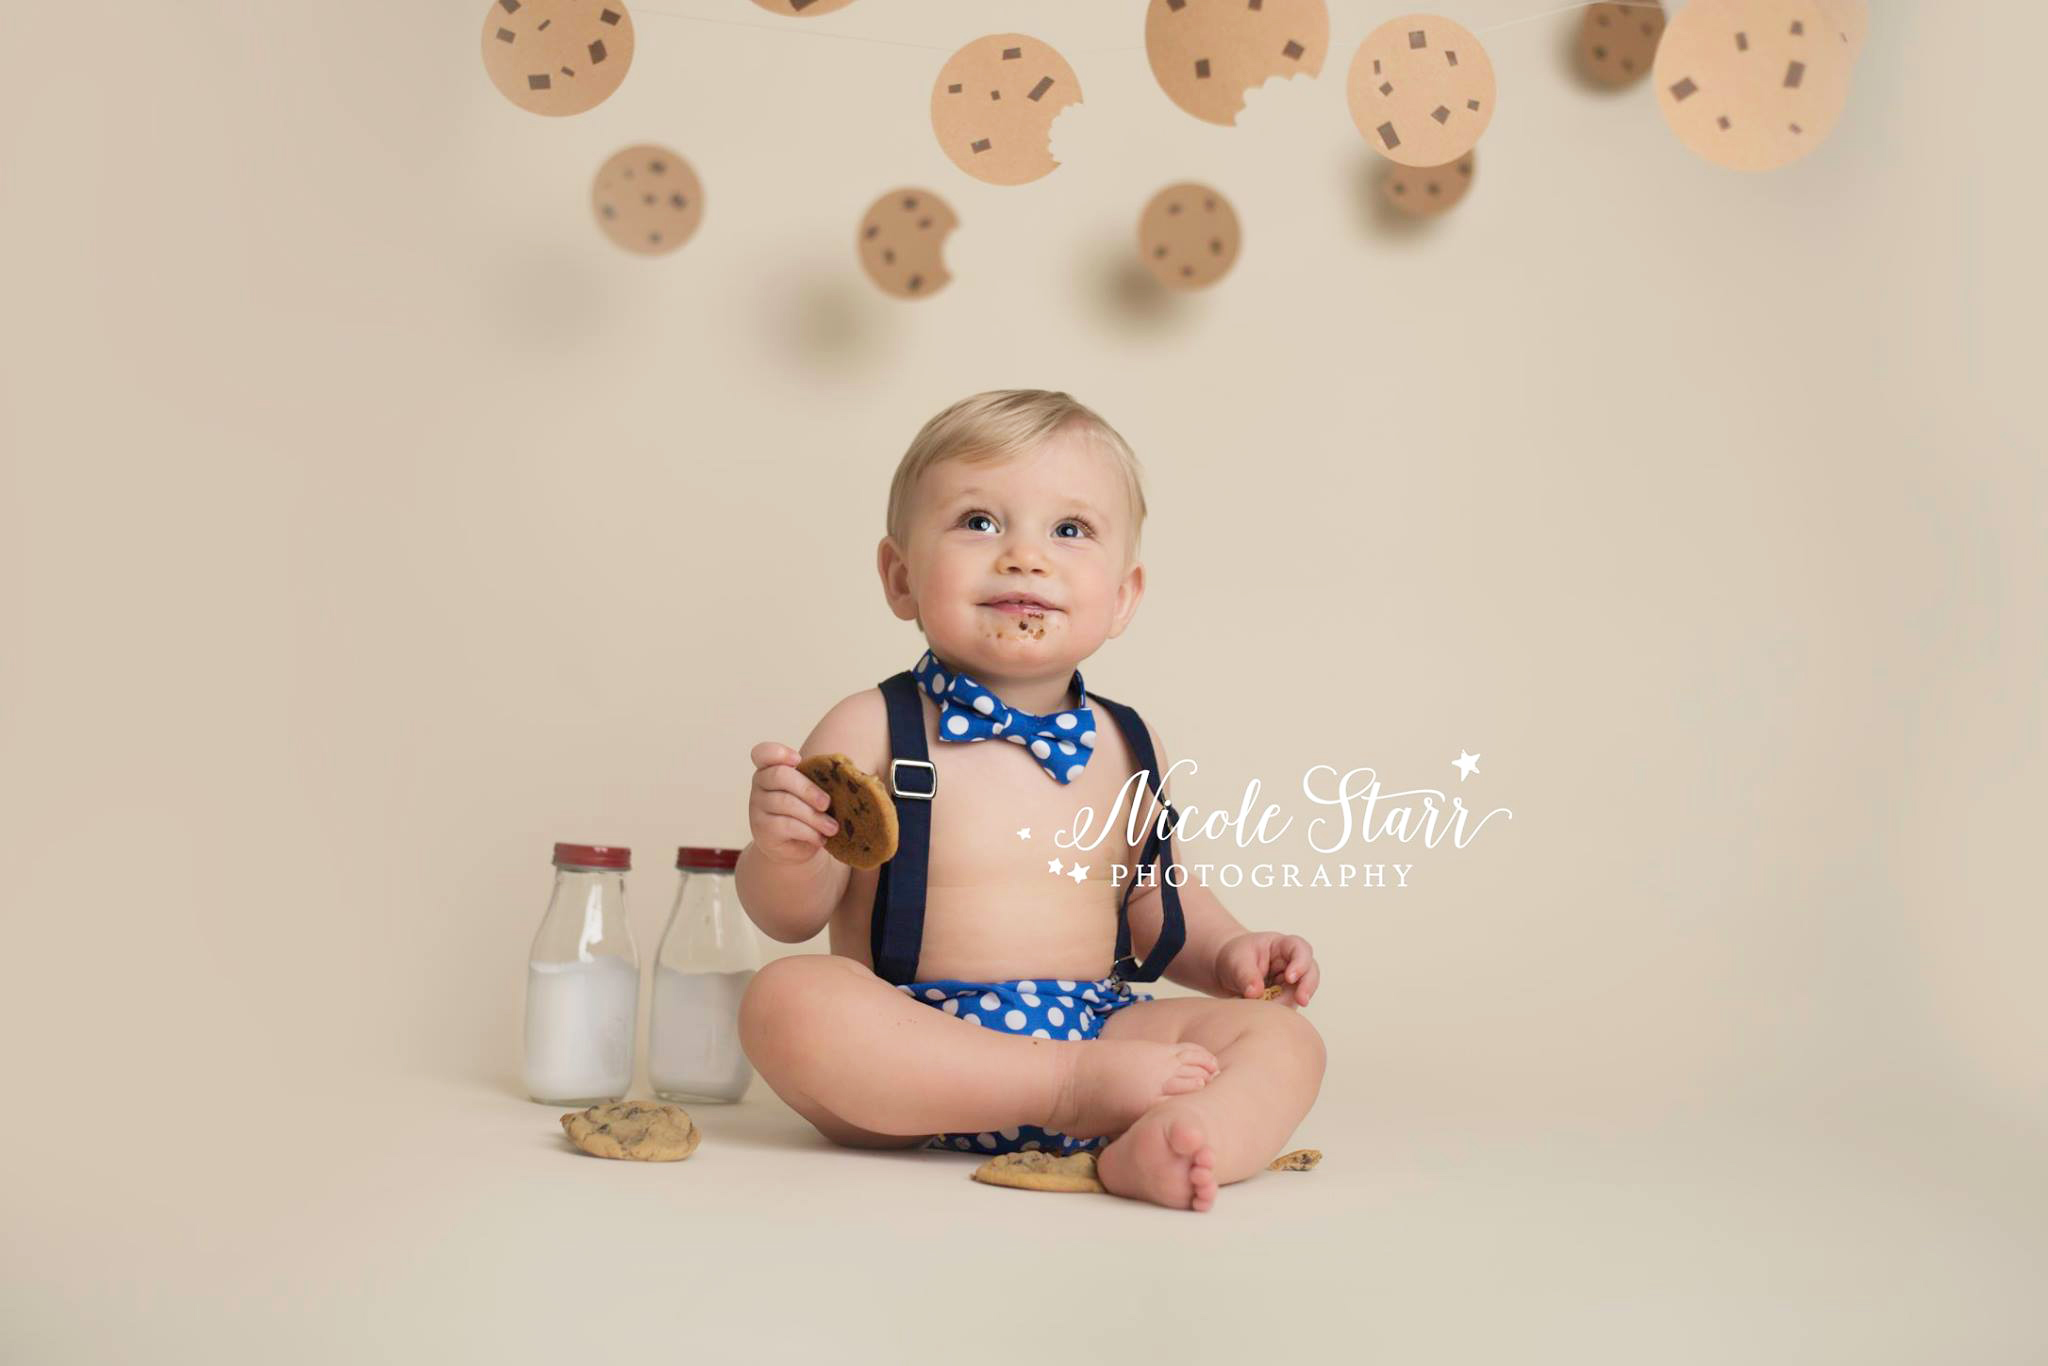 WM v2 cookies and milk.jpg